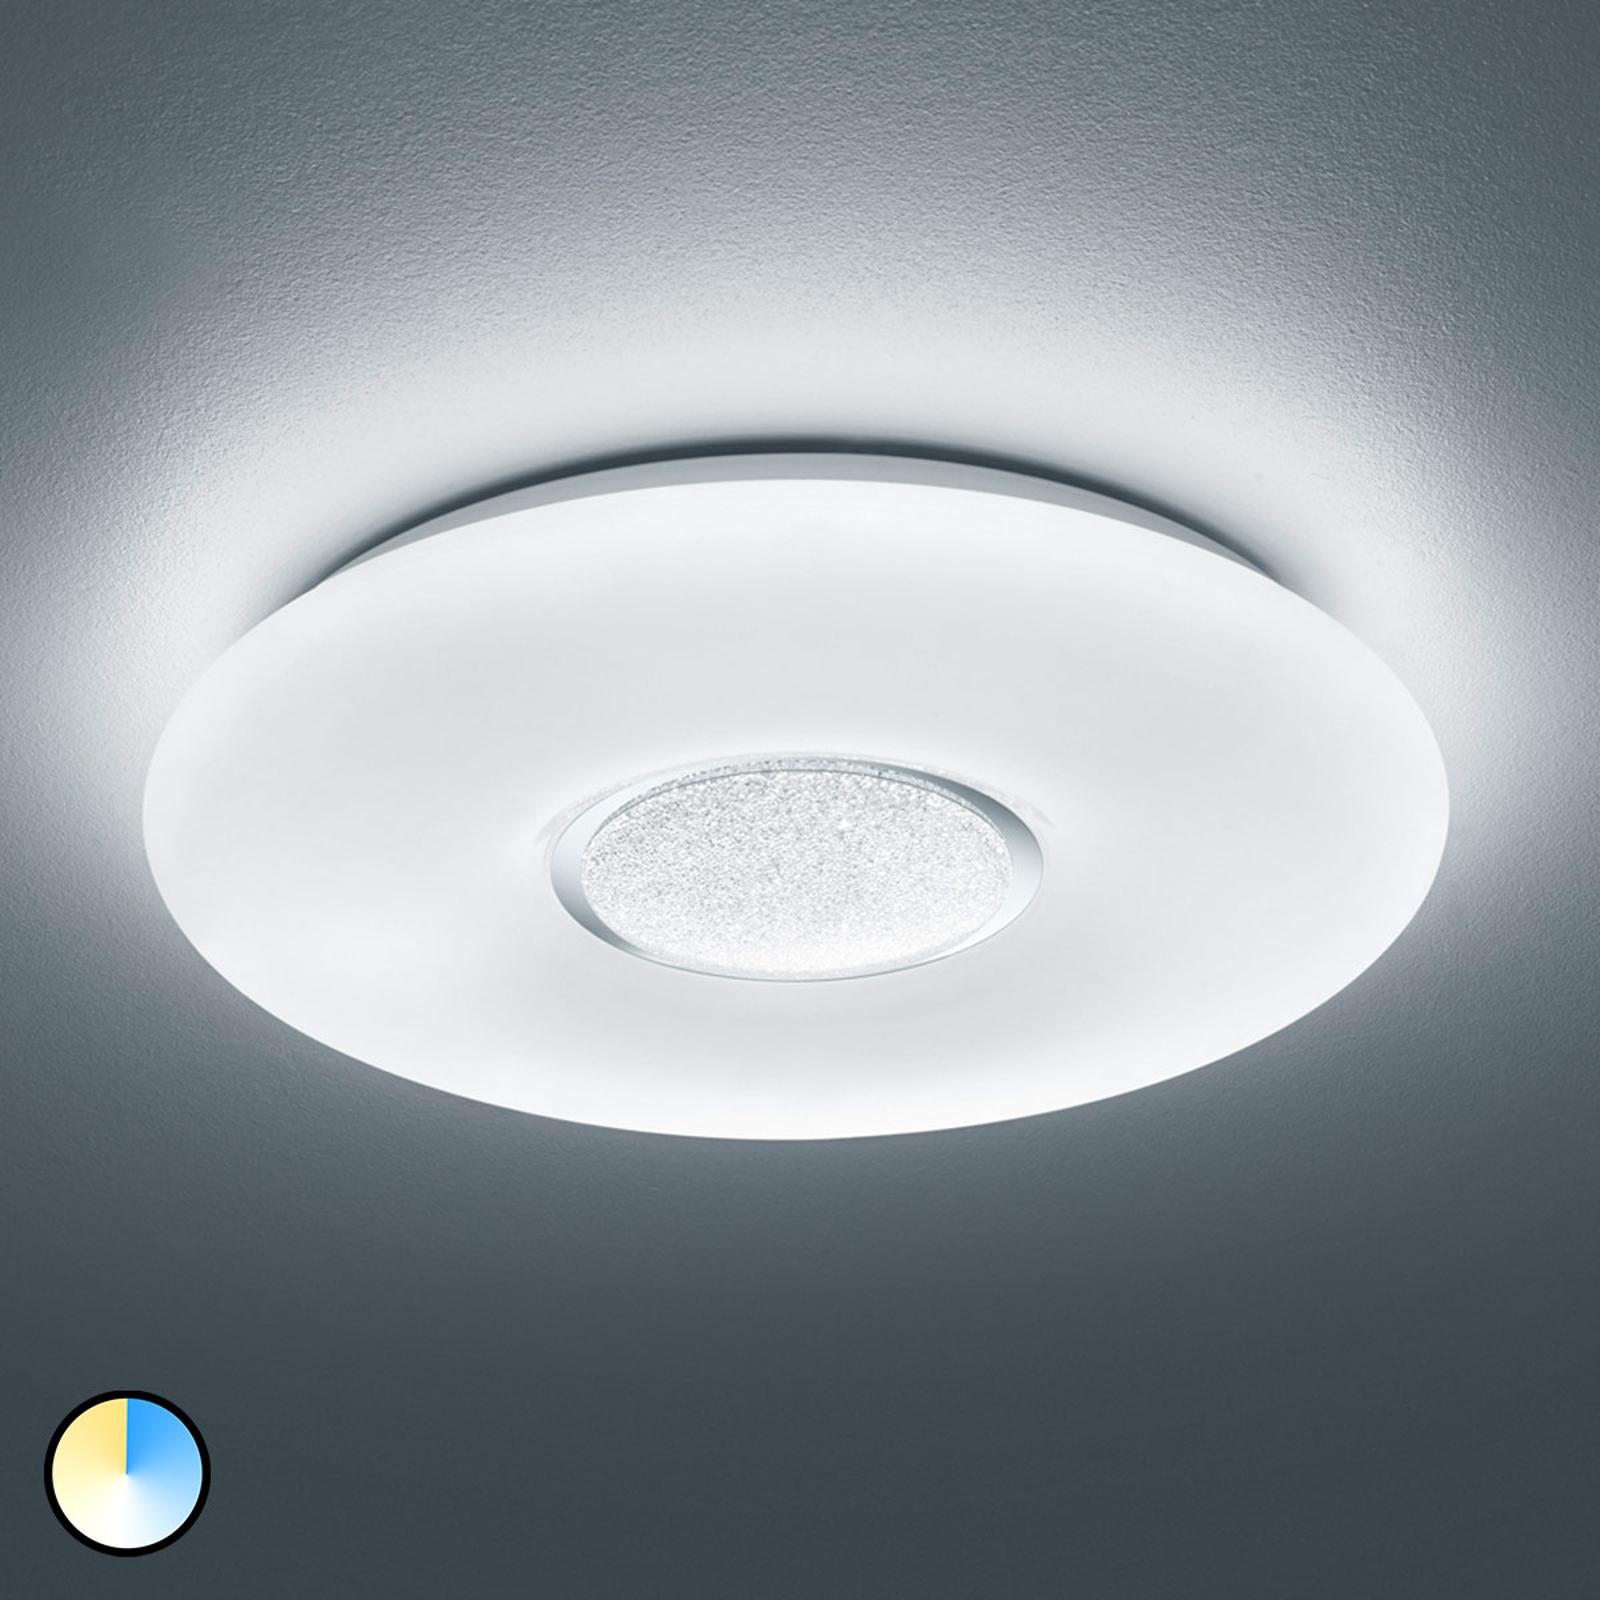 LED-taklampe Akina med fjernkontroll